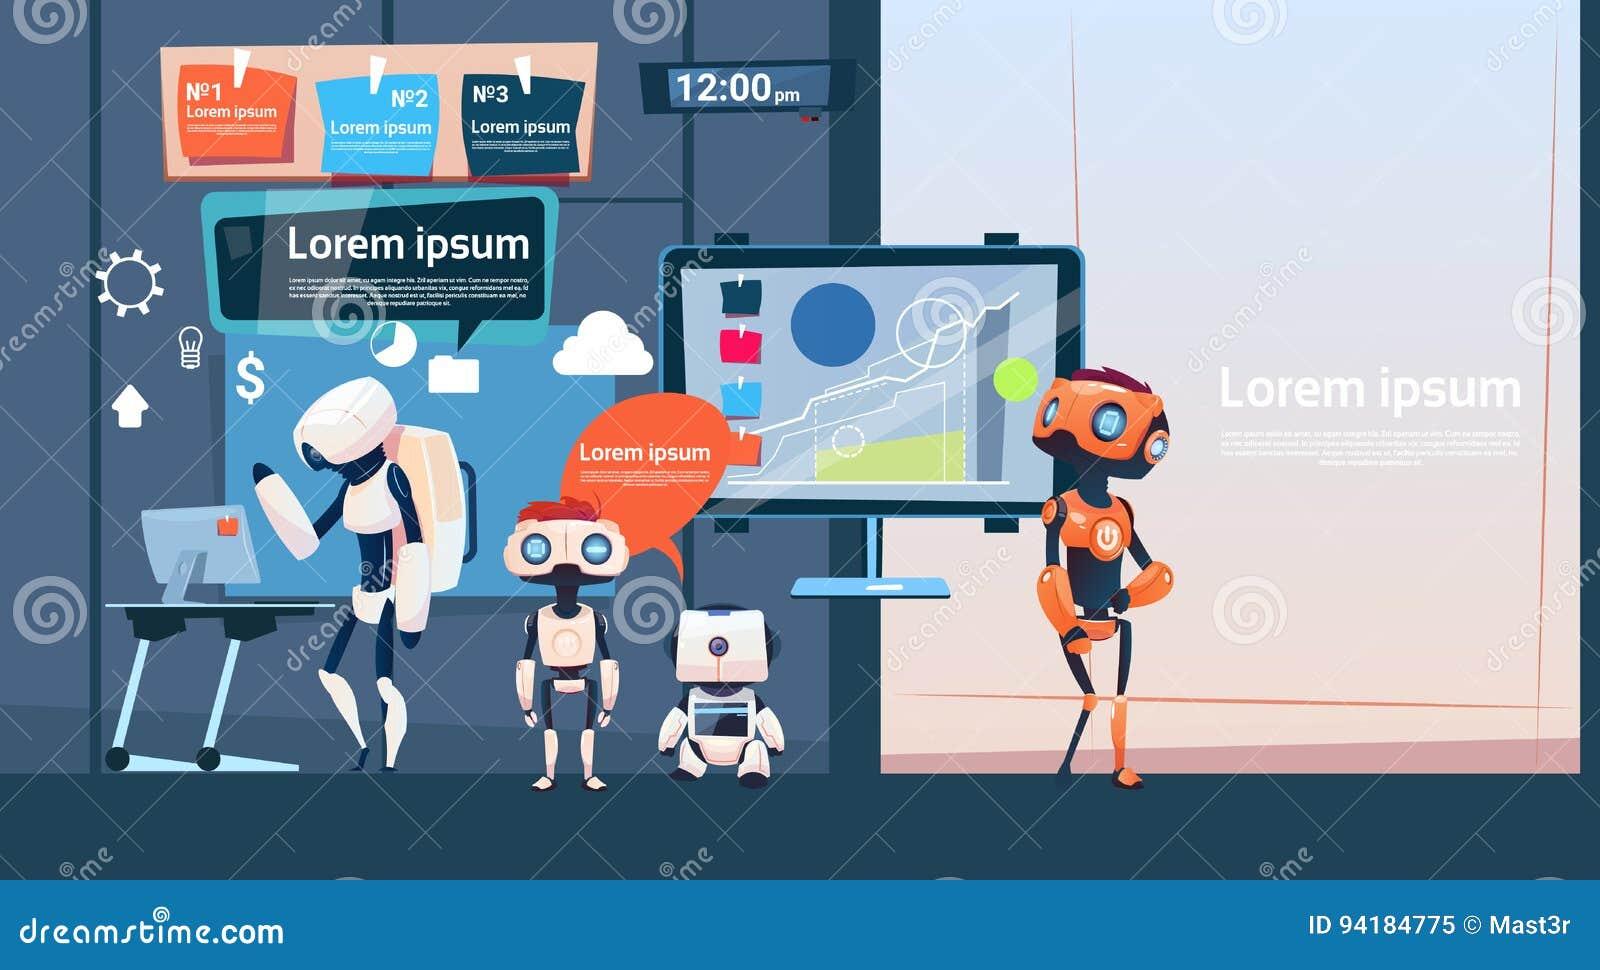 Modern Kontor Affär Robotar Gruppera Arbete, Företag Cyborg Team Banner With Copy Space